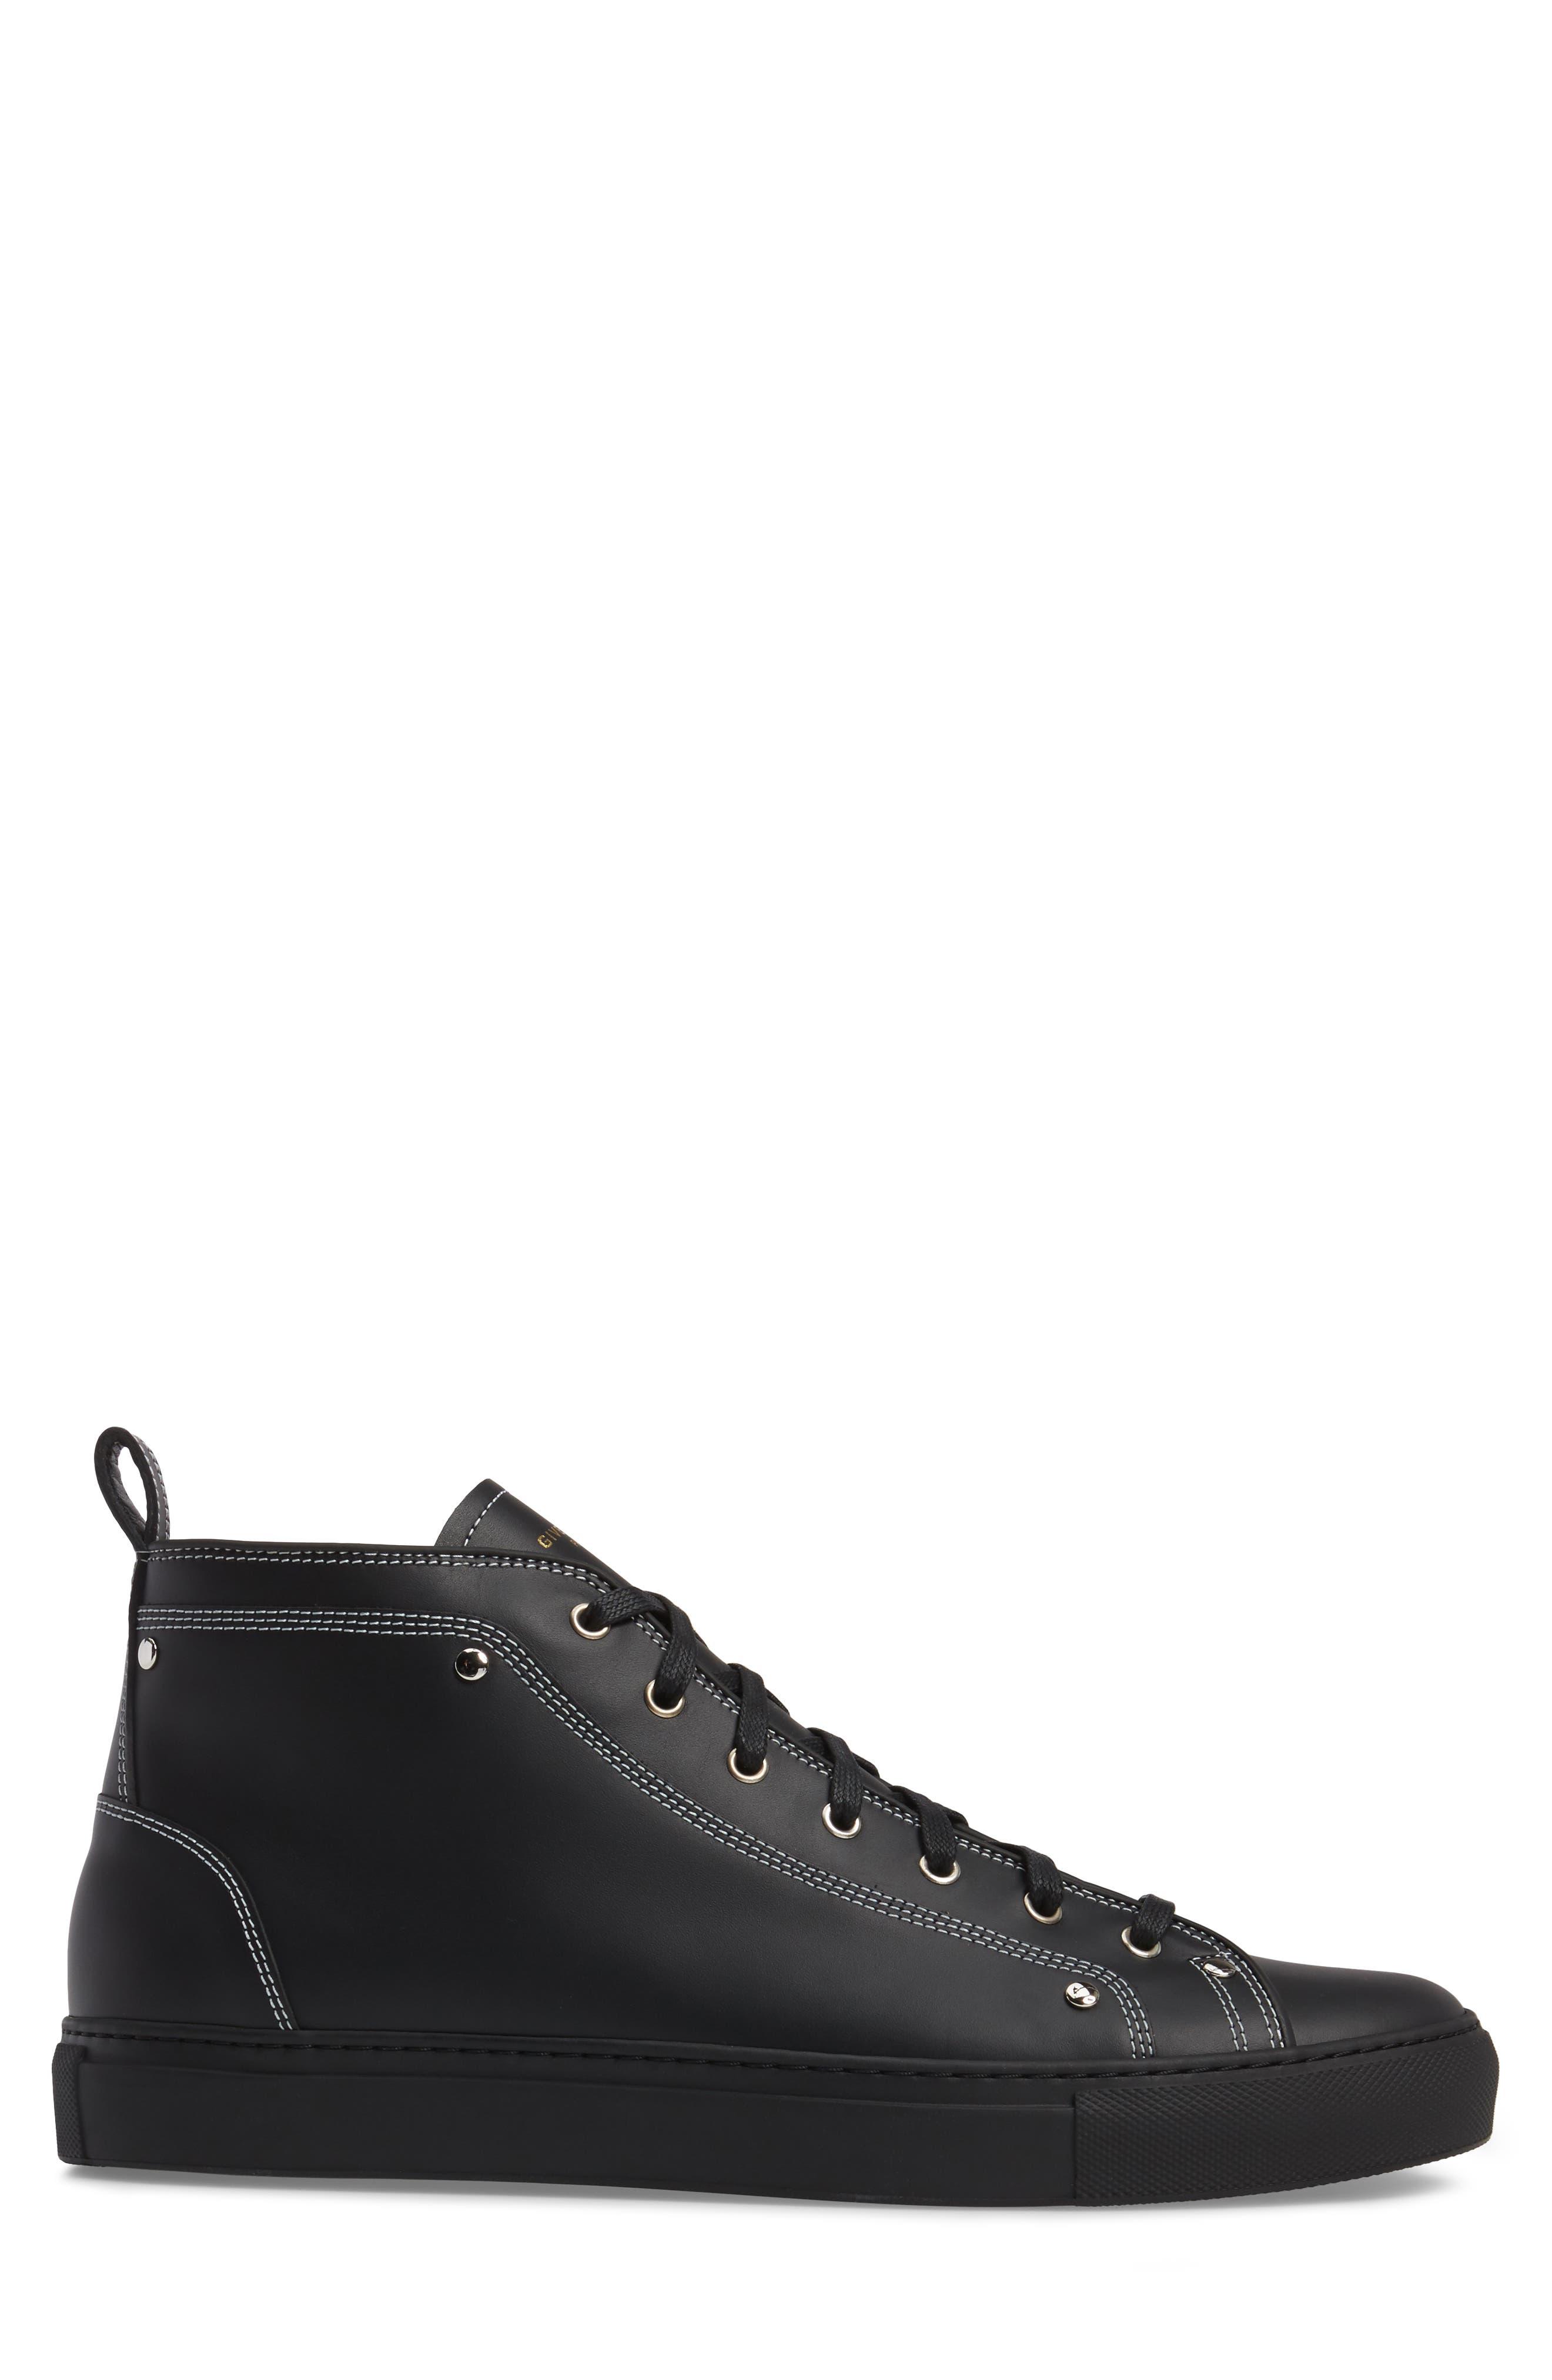 High Top Sneaker,                             Alternate thumbnail 3, color,                             Black